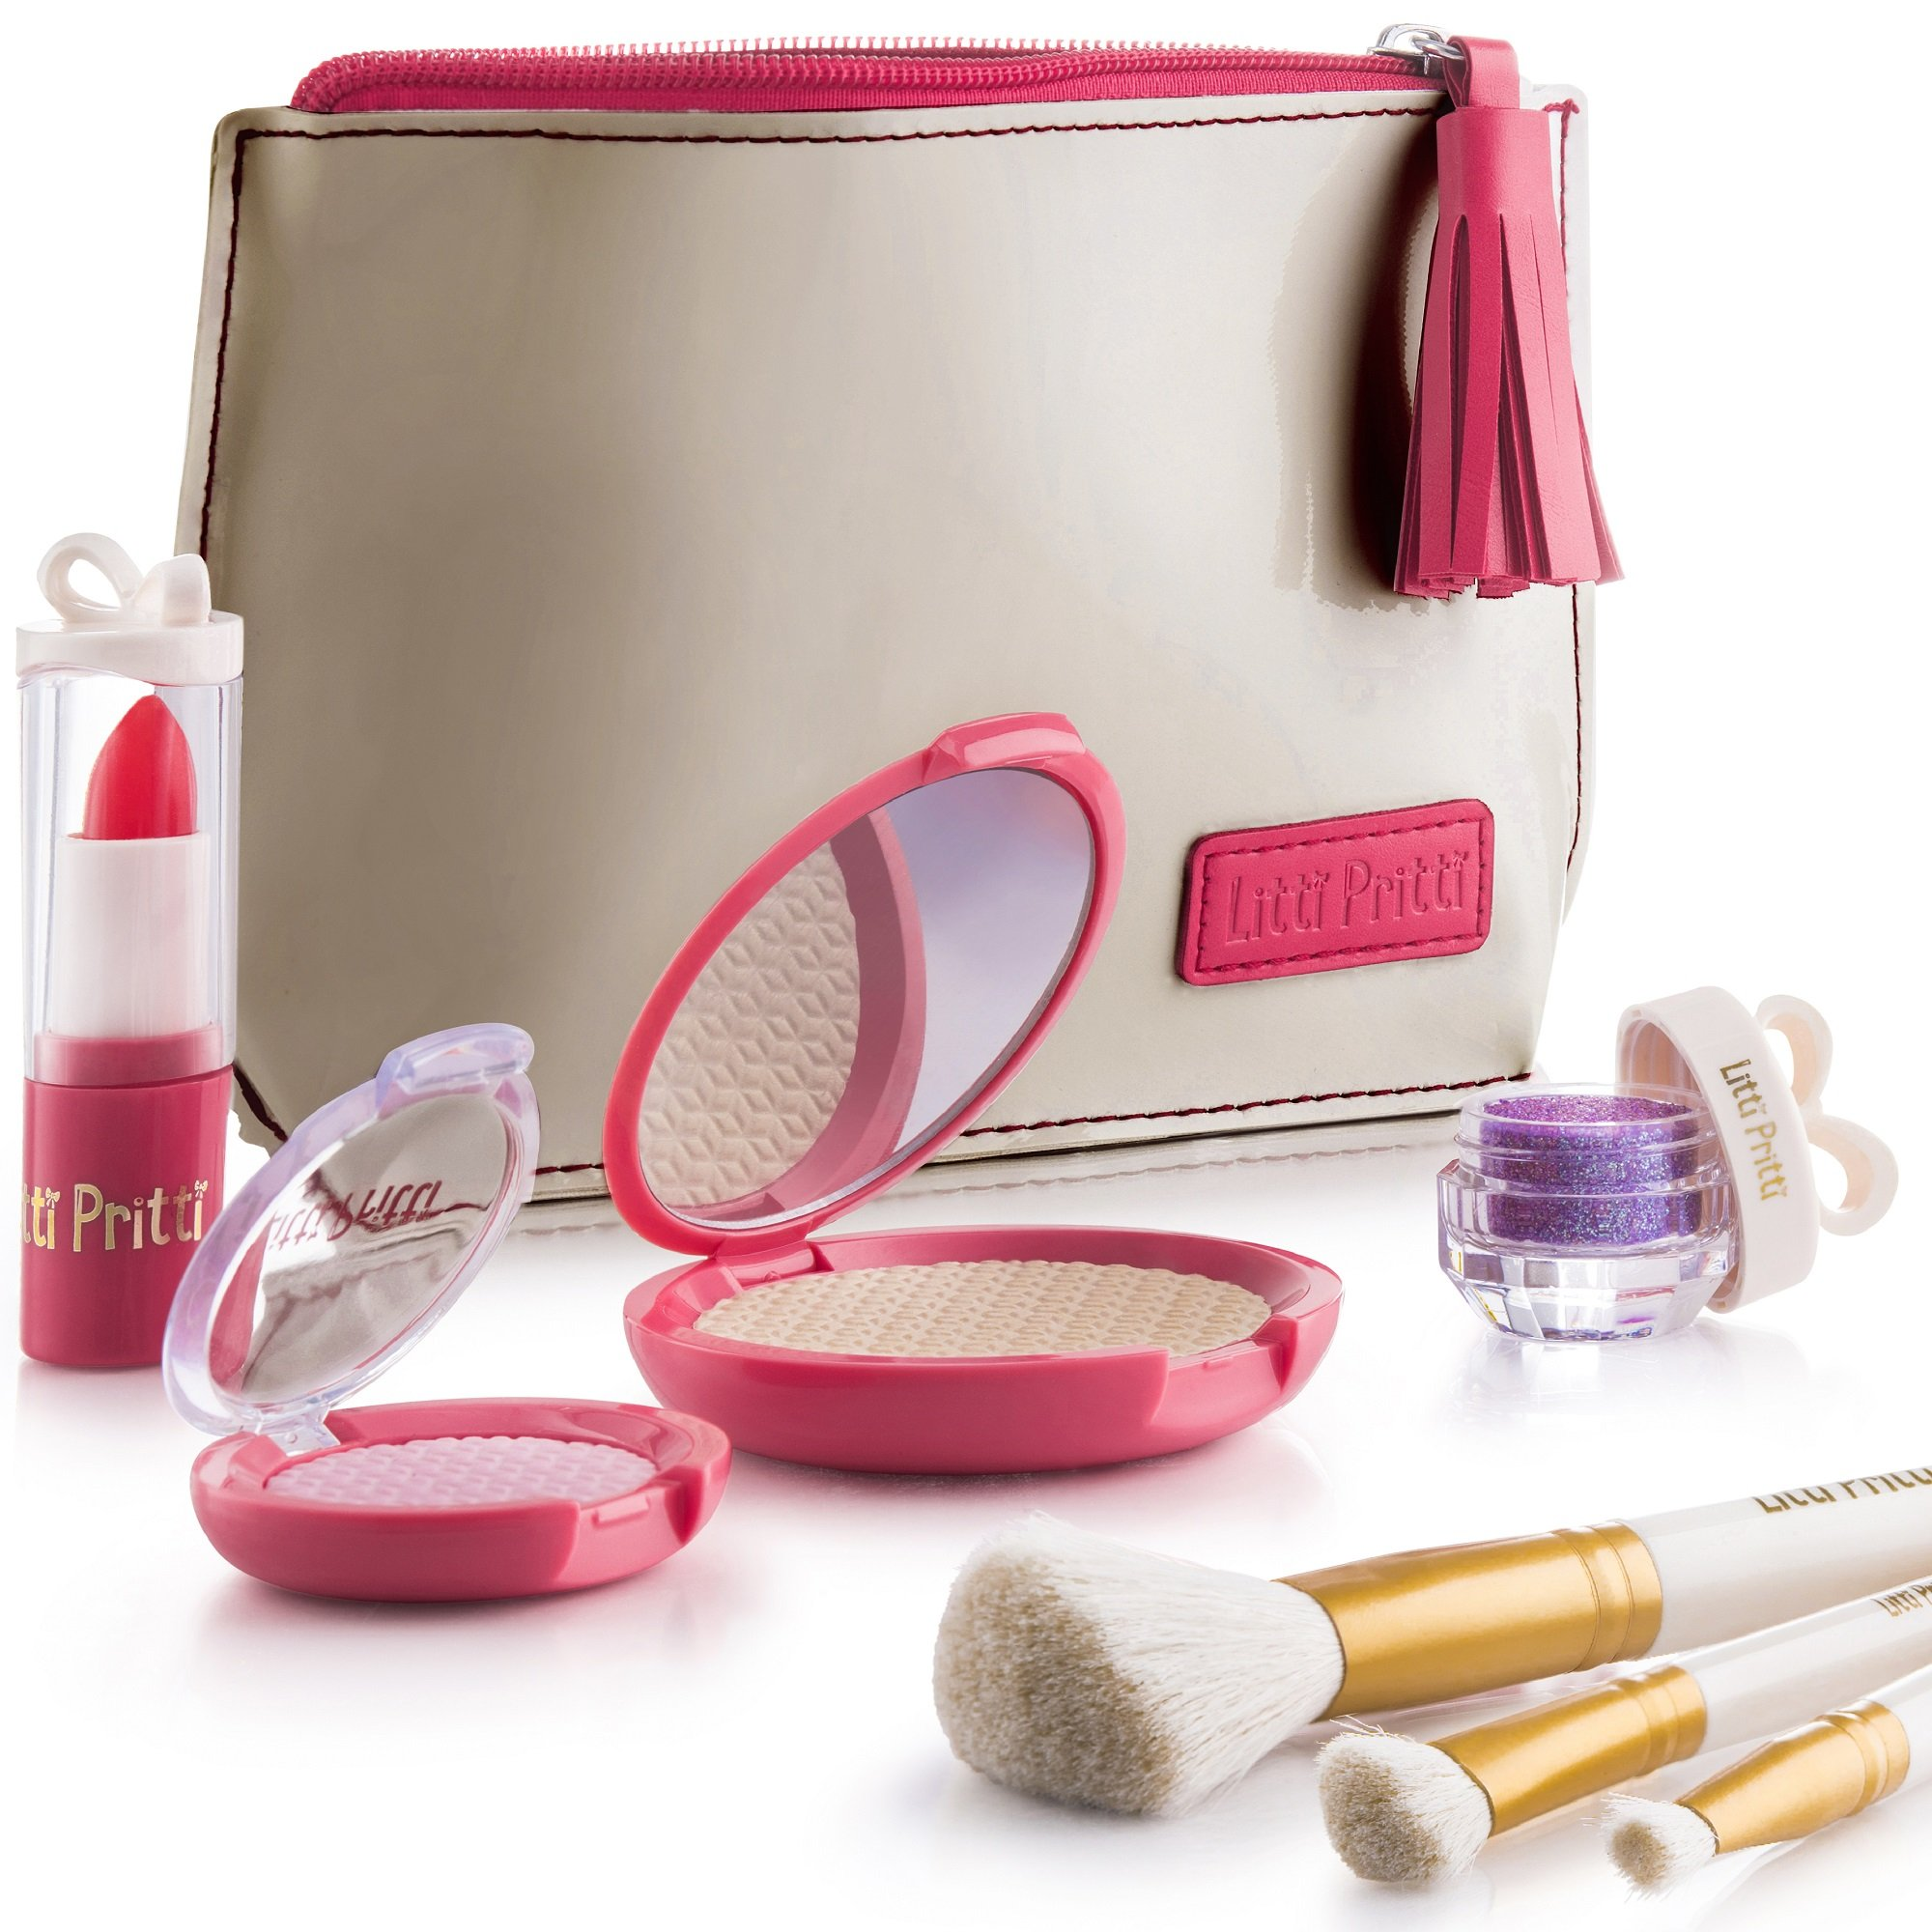 Litti Pritti Pretend Makeup for Girls Set - 8 Piece Cosmetic Play Makeup Kit - PU Leather Case by Litti Pritti